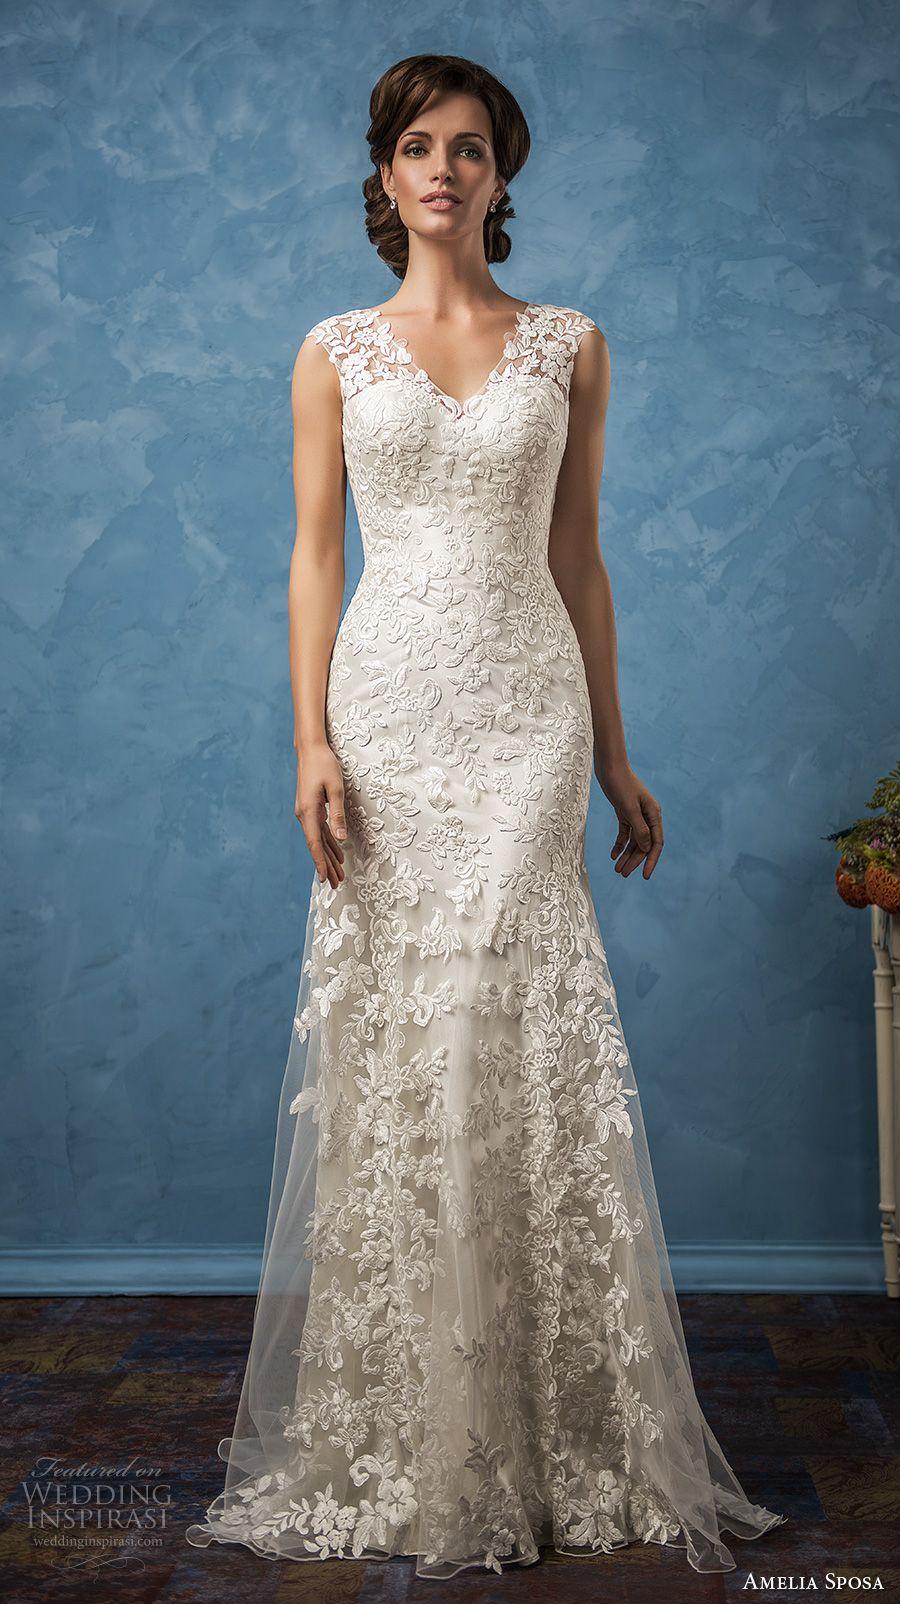 sheath mermaid wedding dresses 2017 amelia sposa bridal gowns v ...